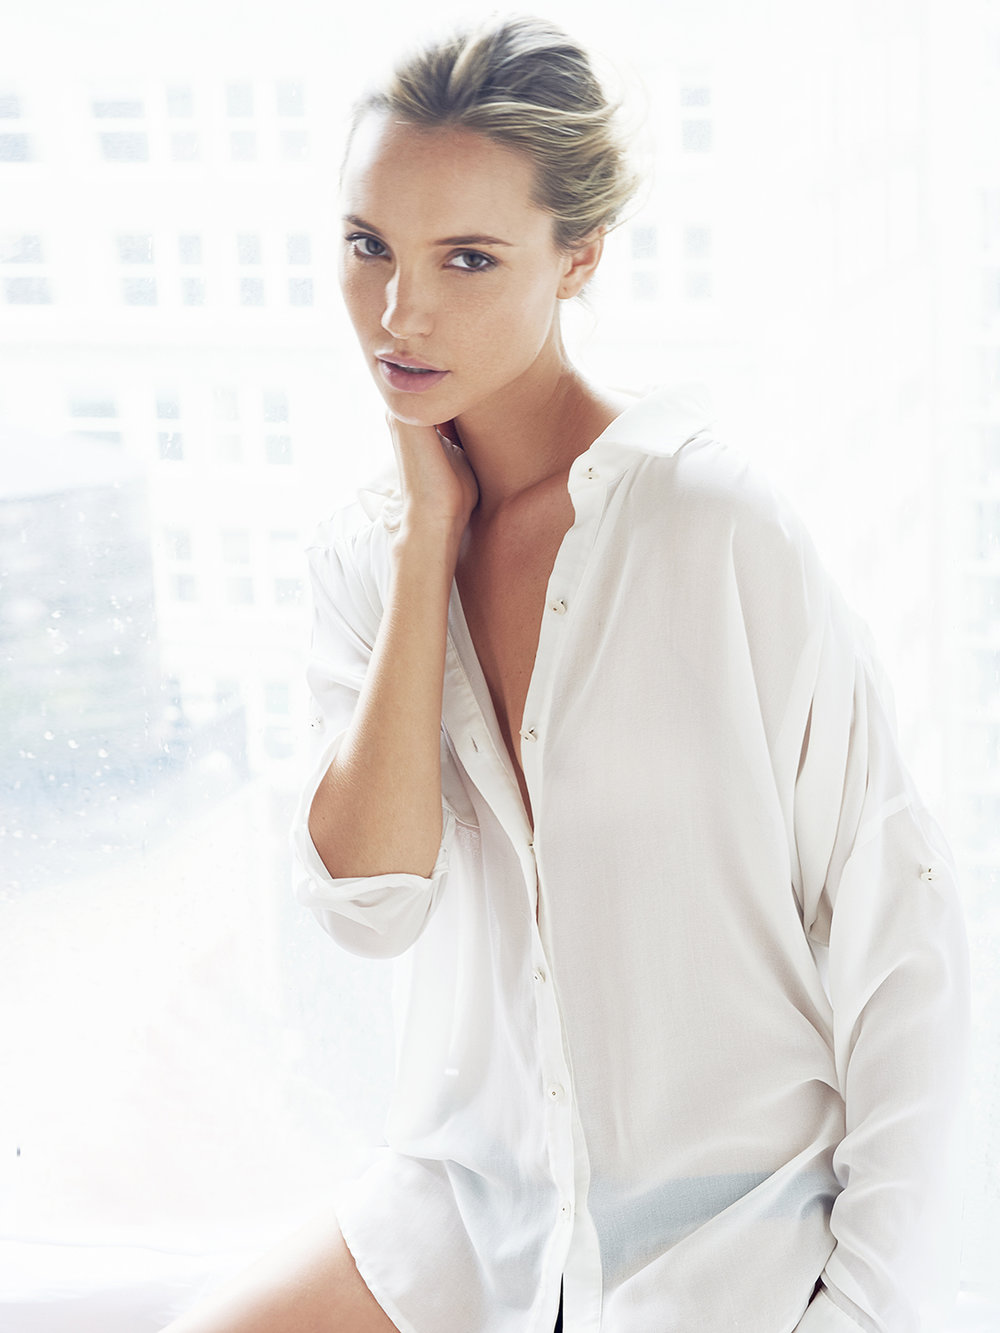 Harten_Nafziger_beauty_photographer_valeri_paumelle_agent (7).jpg